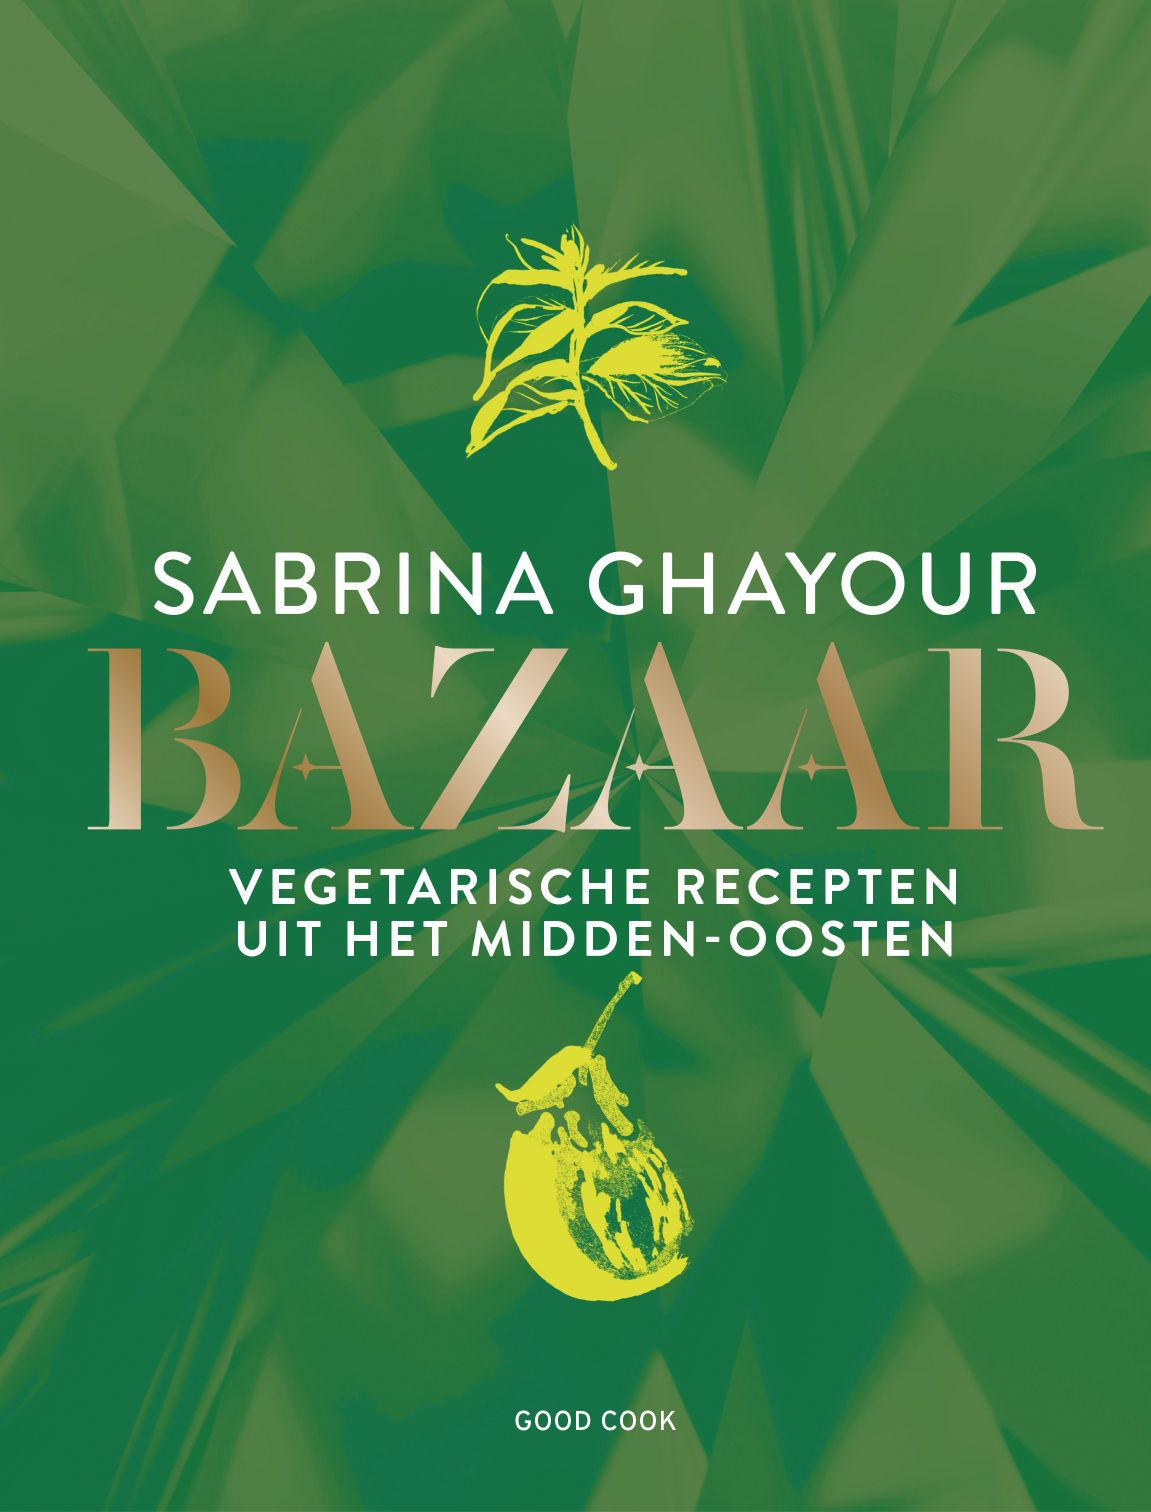 Bazaar – Sabrina Ghayour (review)